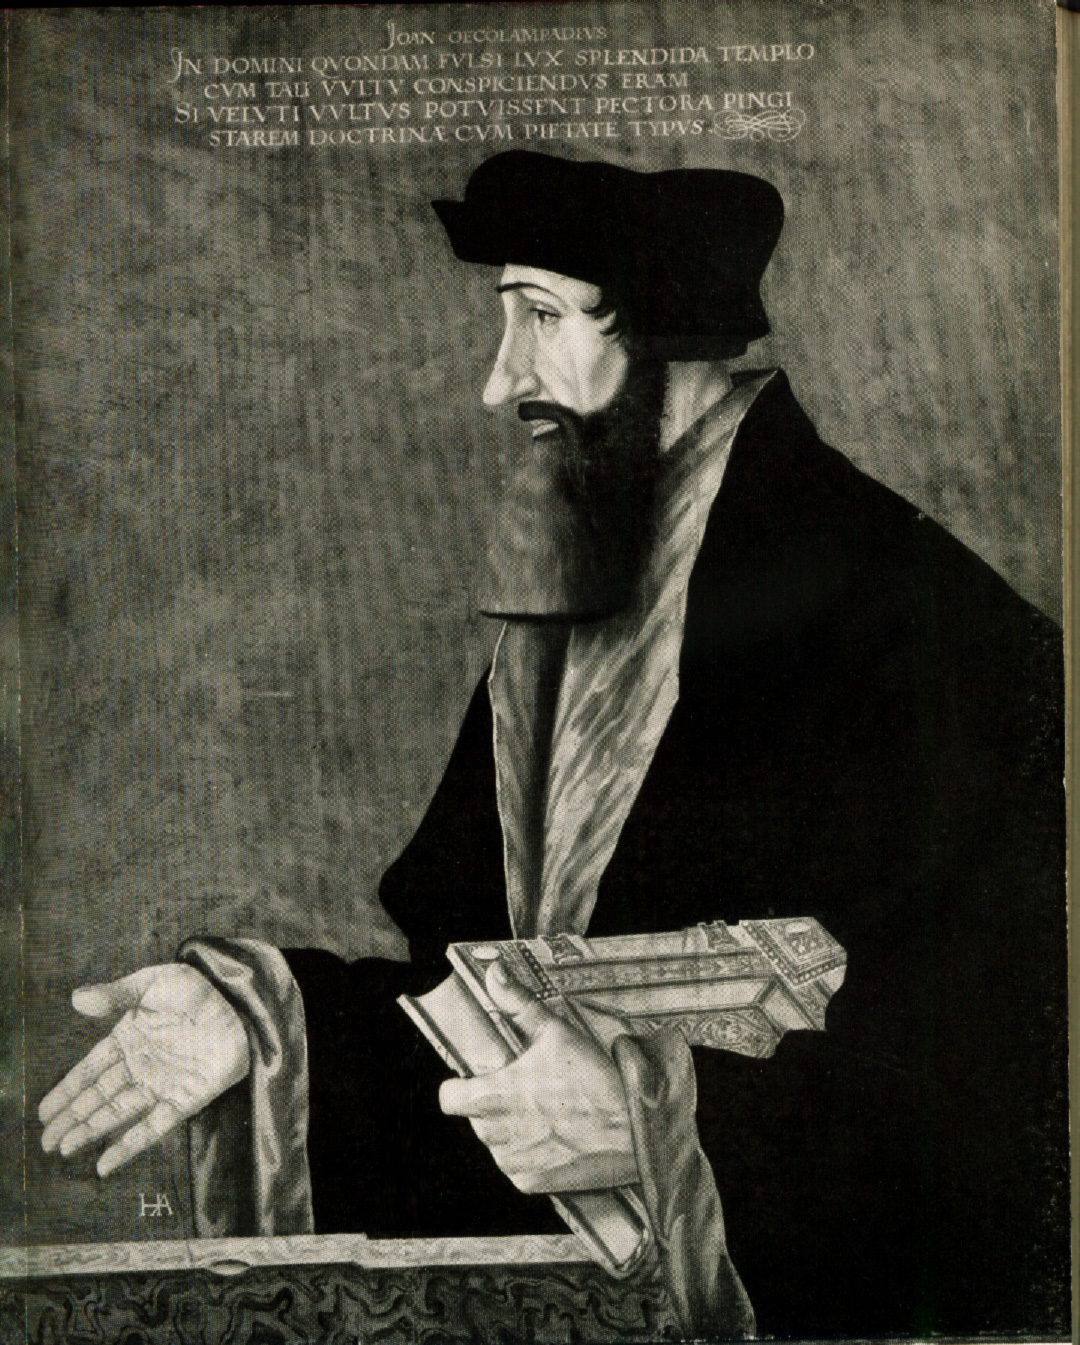 http://upload.wikimedia.org/wikipedia/commons/9/9b/Johannes_Oecolampadius.jpg